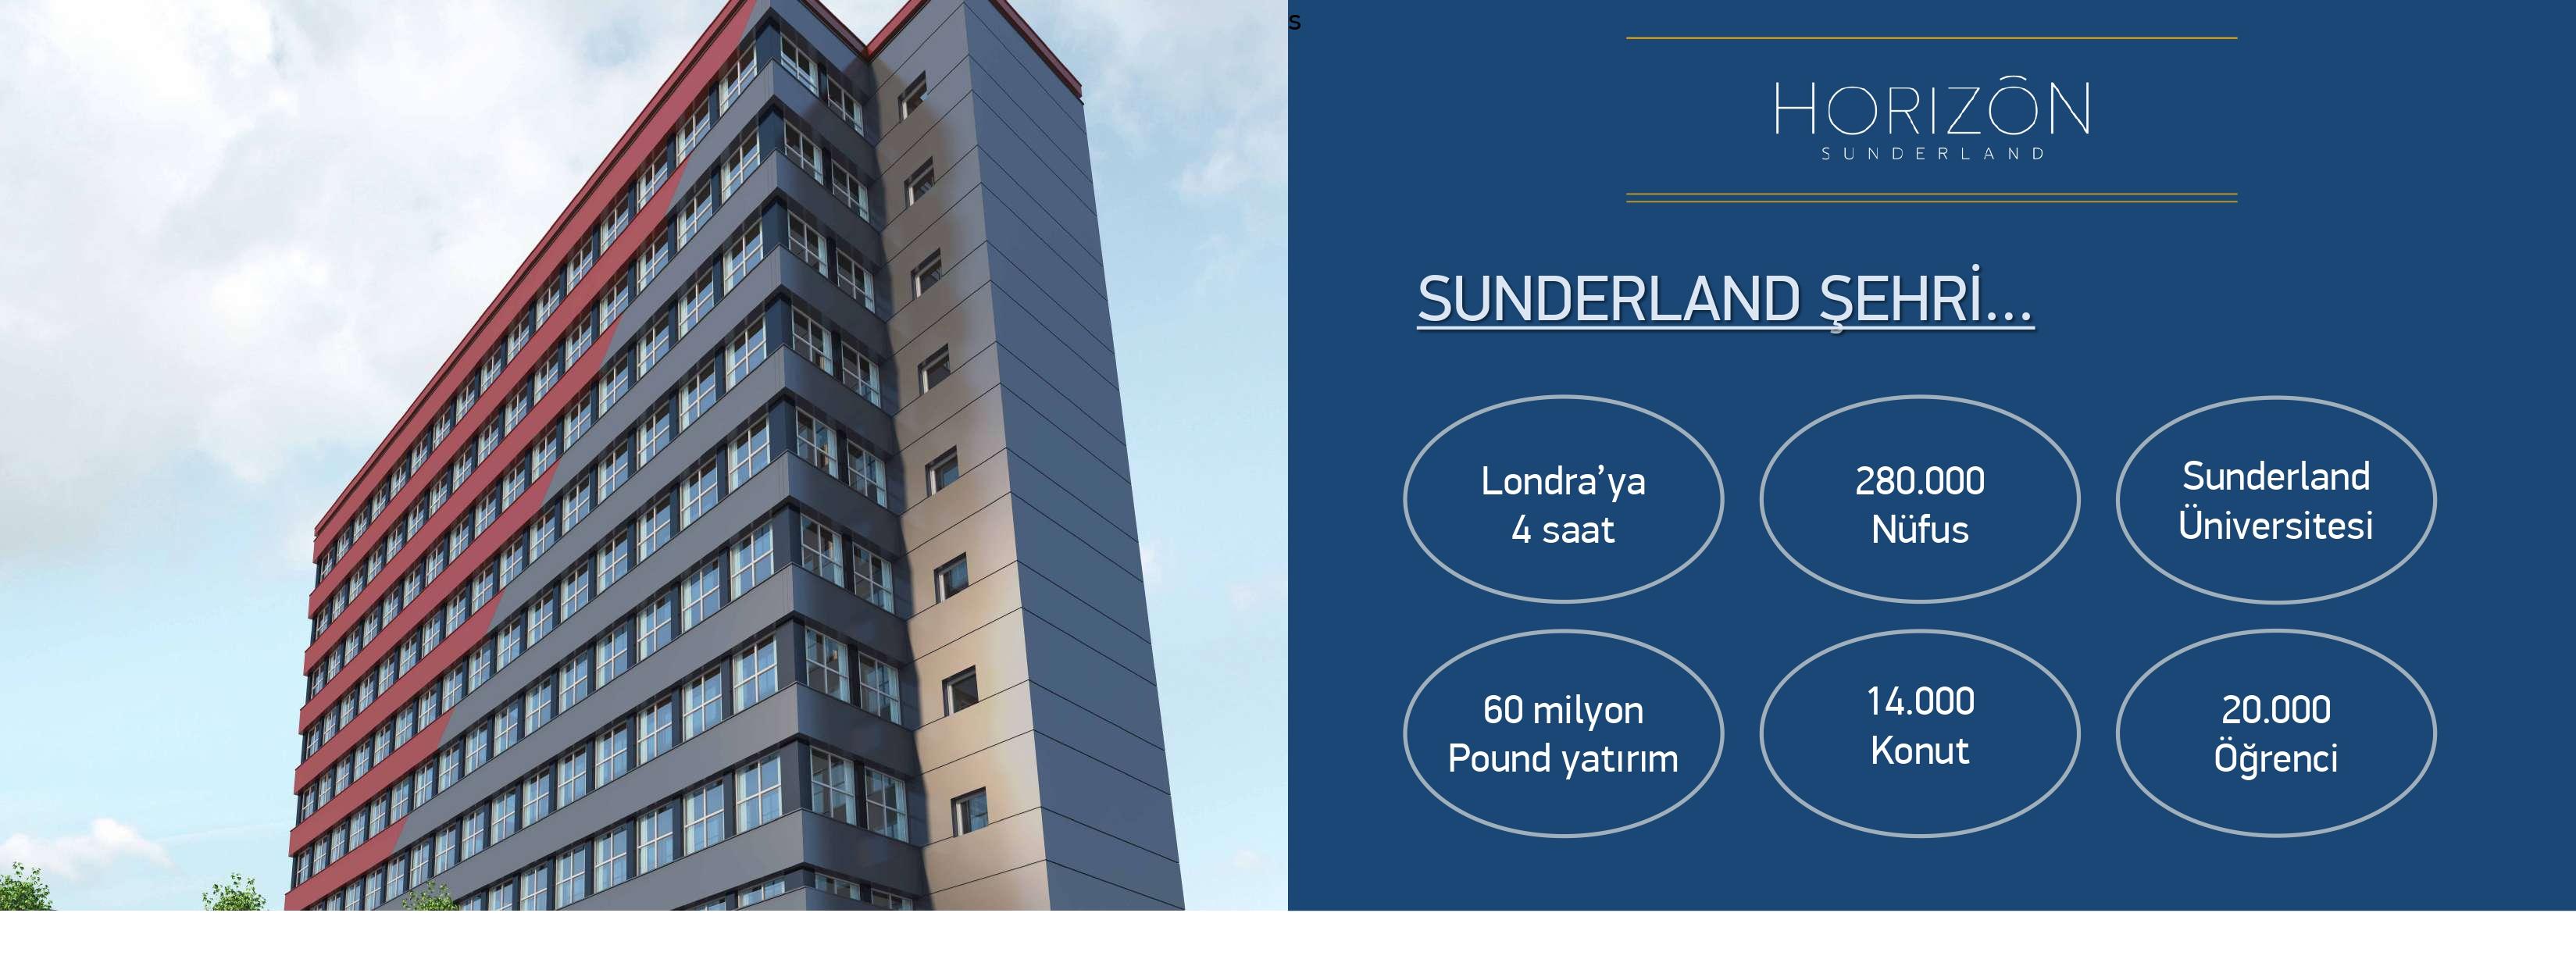 Horizon Sunderland -Ahmet Ziyal_v02_page-0002